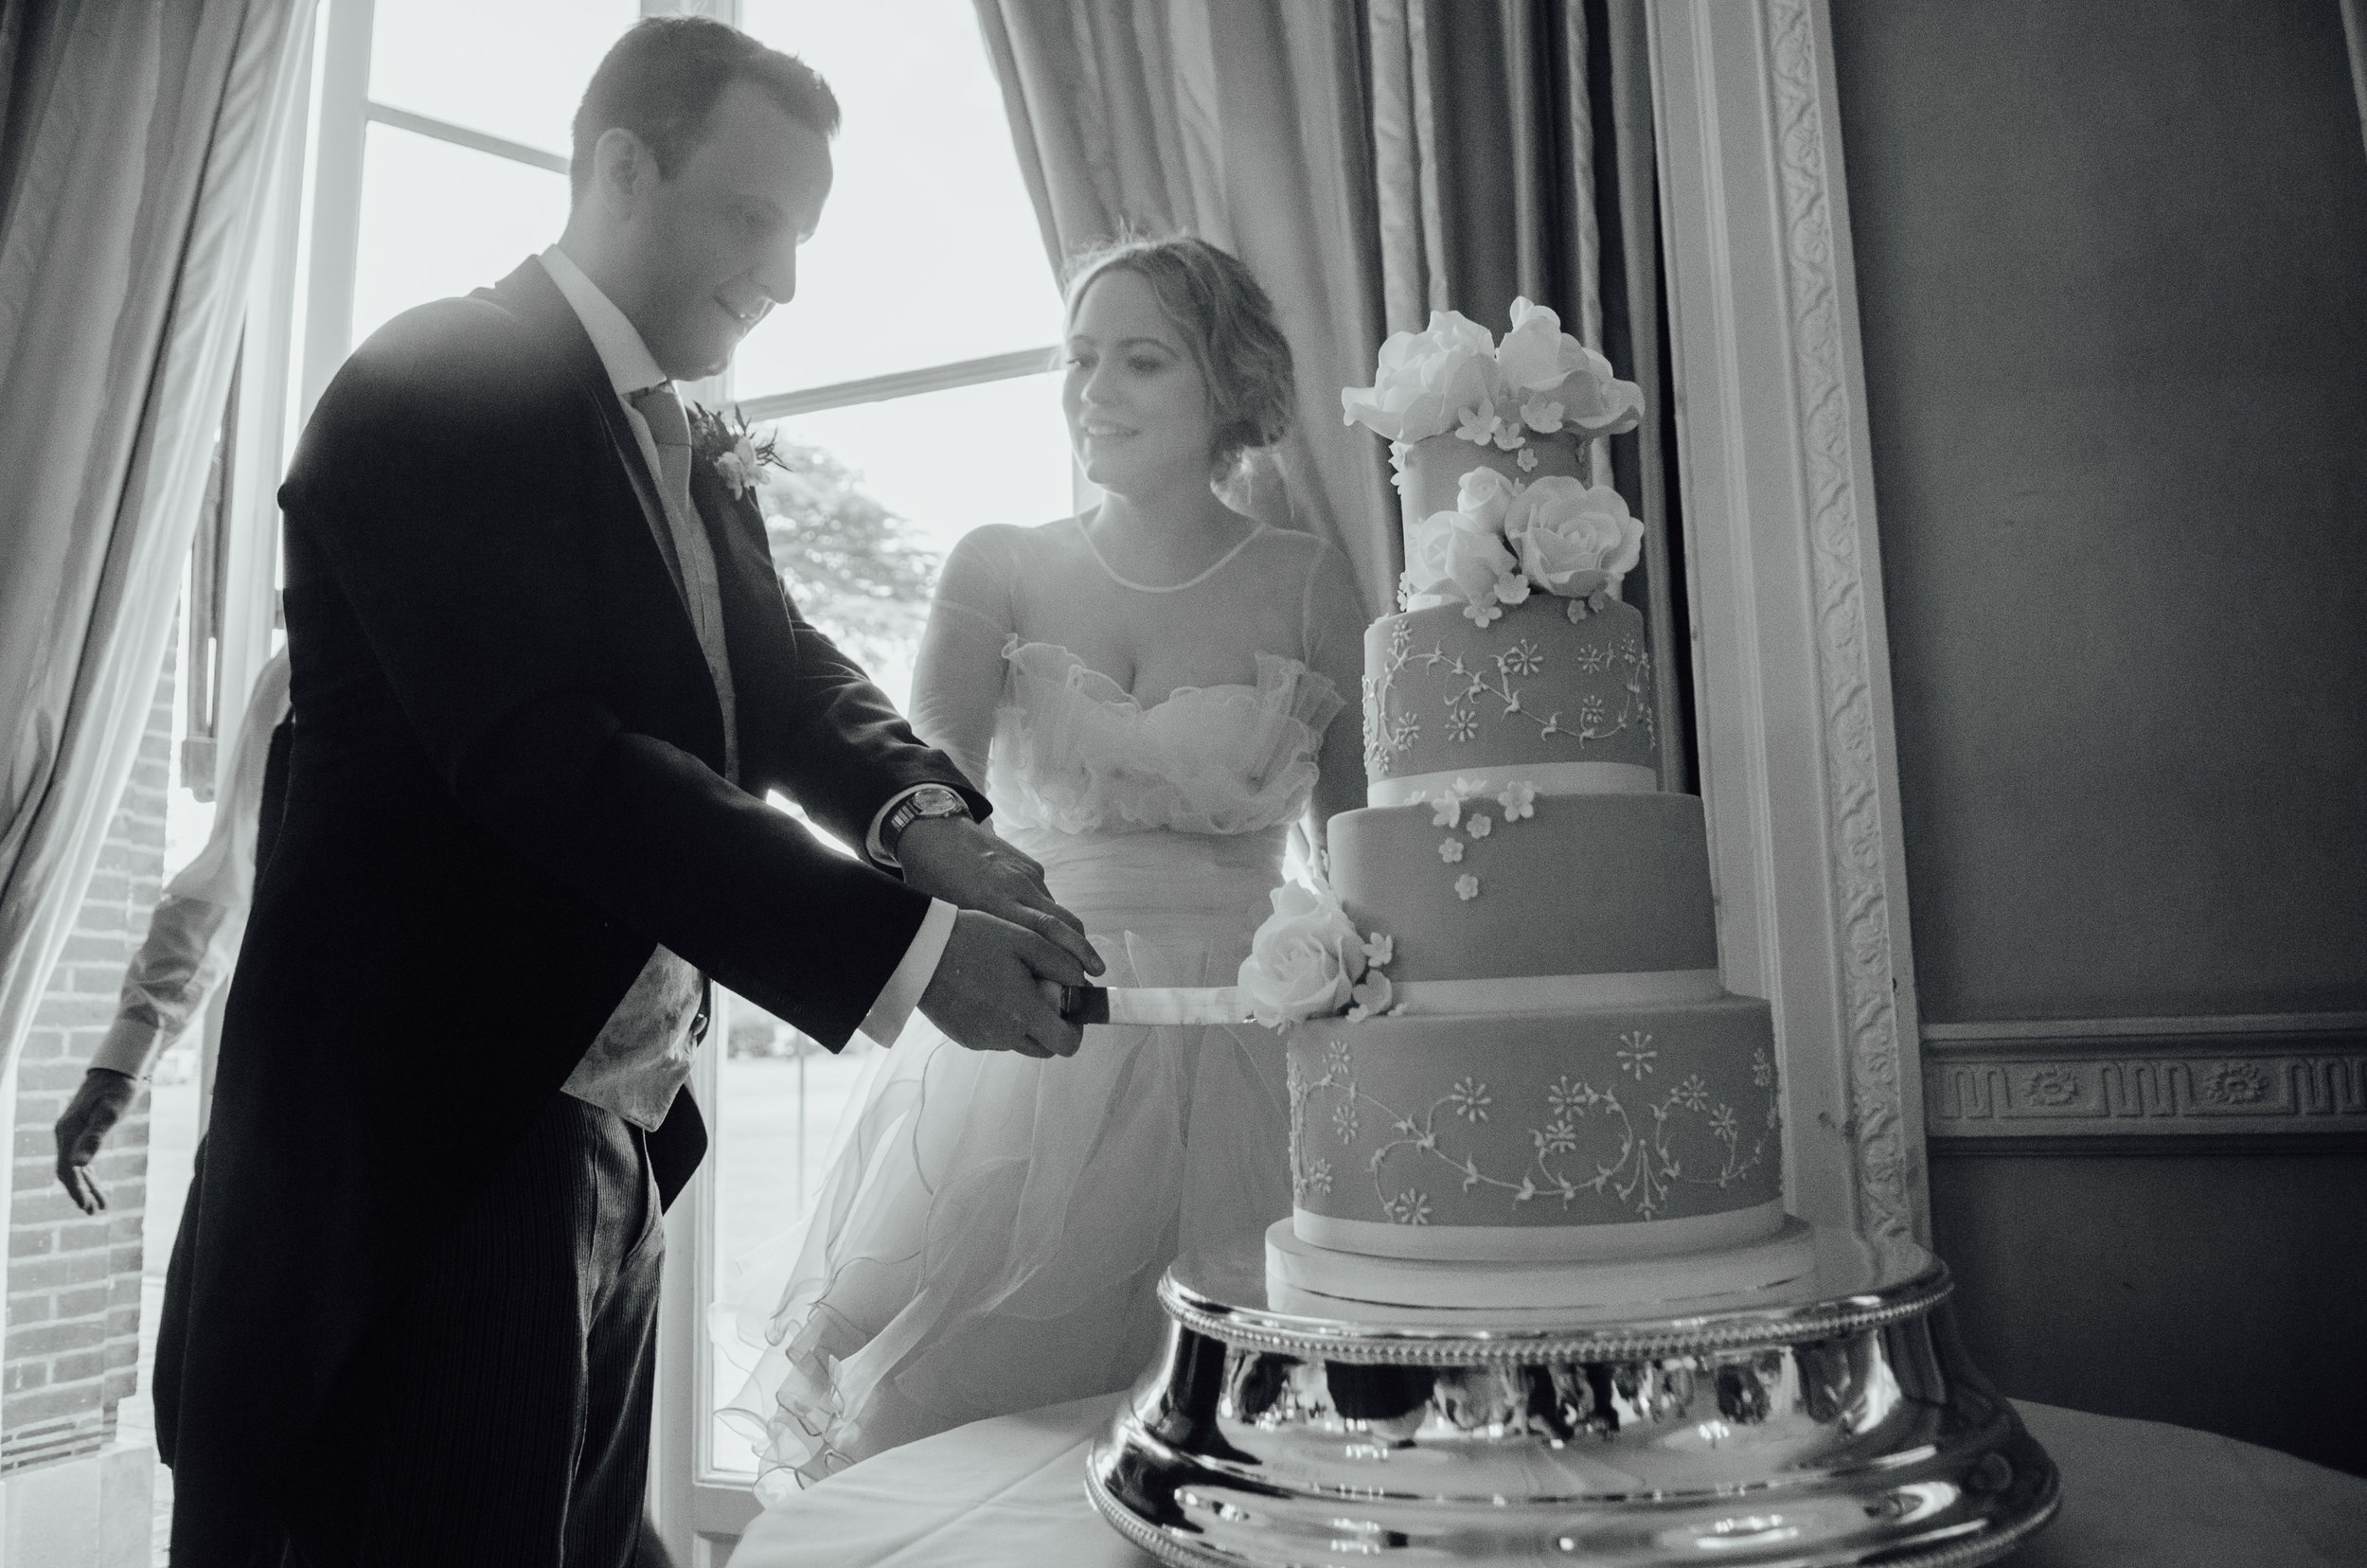 cleland-studios-wedding-photography-76.jpg